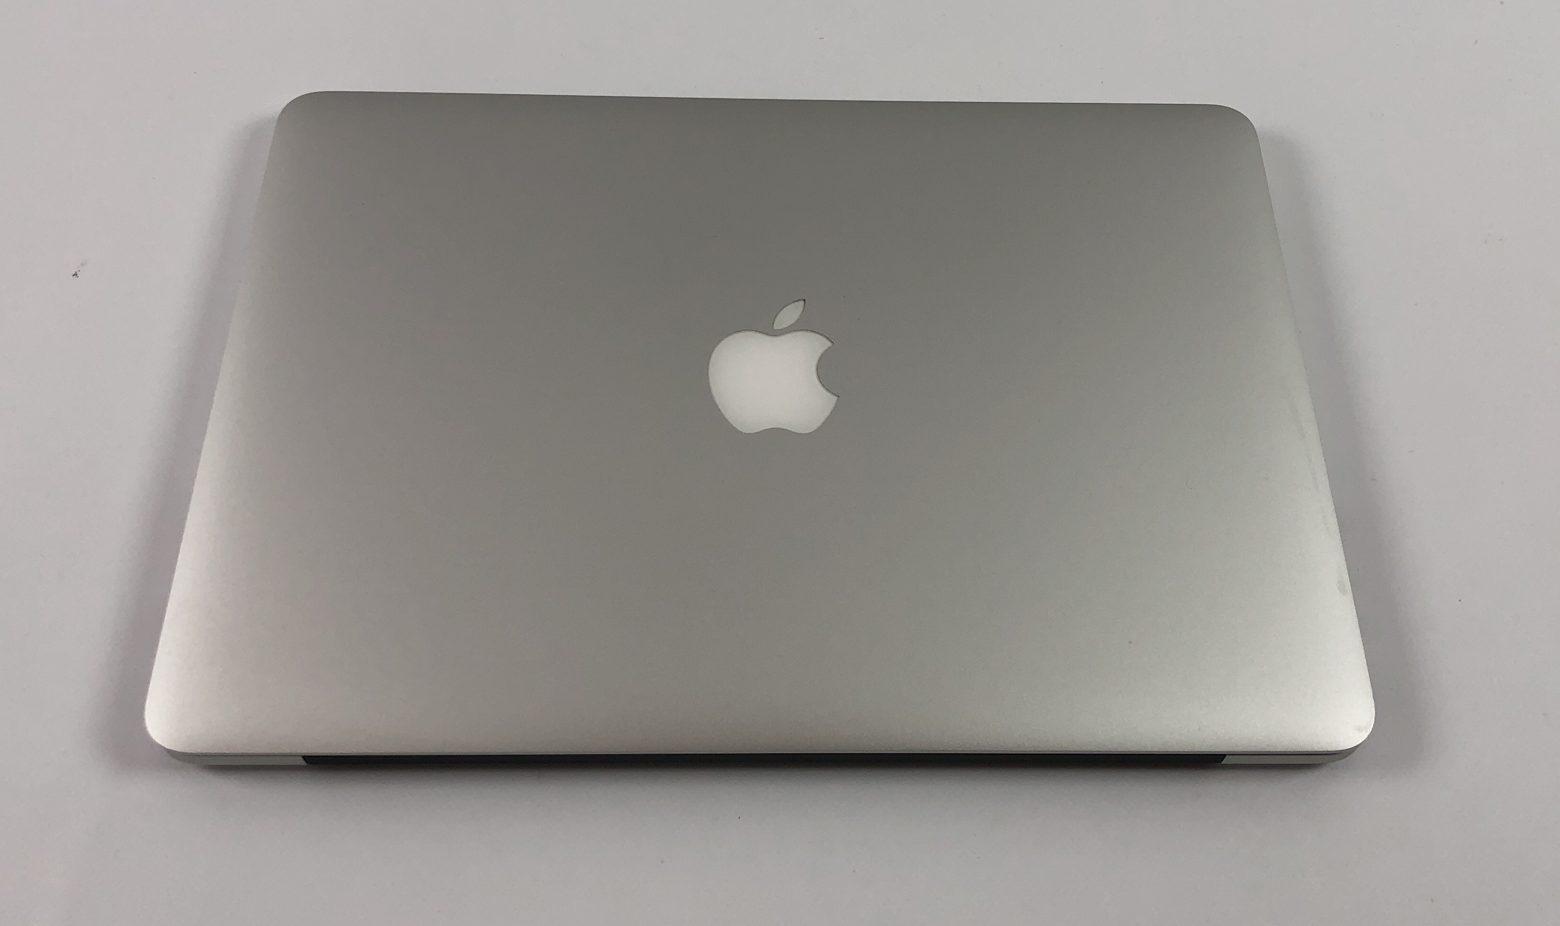 "MacBook Pro Retina 13"" Early 2015 (Intel Core i5 2.7 GHz 8 GB RAM 128 GB SSD), Intel Core i5 2.7 GHz, 8 GB RAM, 128 GB SSD, Afbeelding 2"